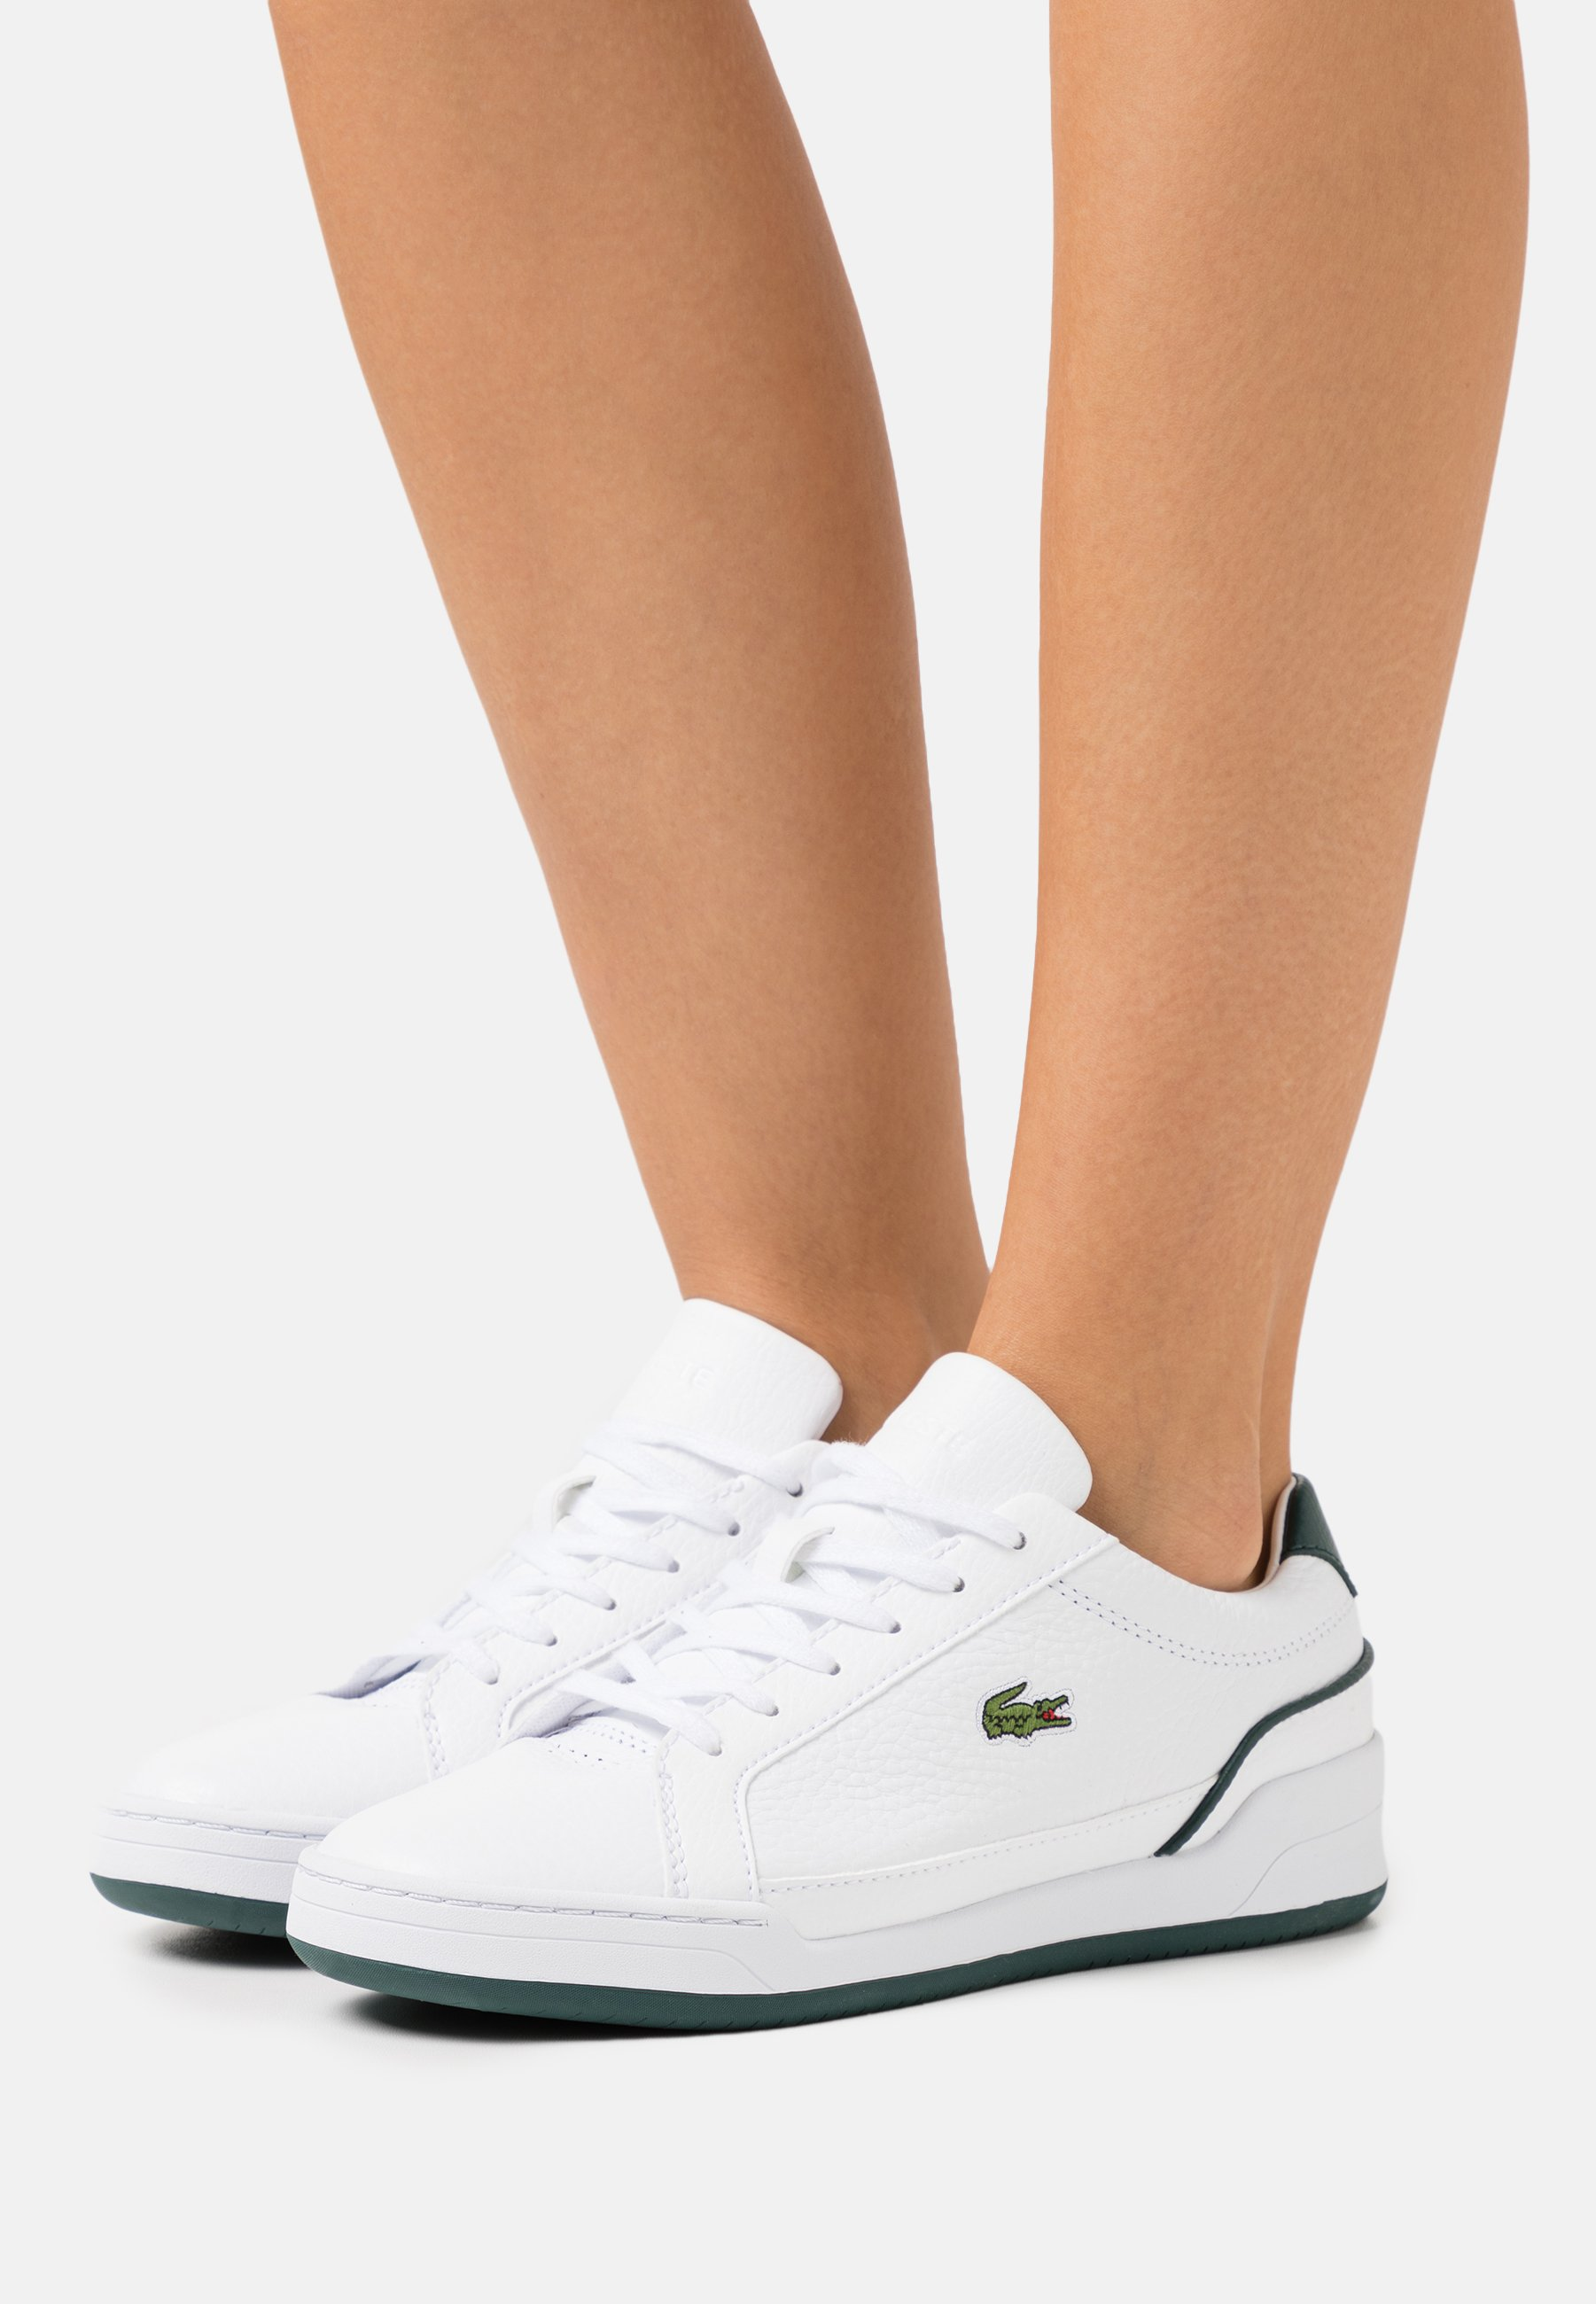 Lacoste Challenge Sneaker Herren NEU Schuhe Turnschuhe